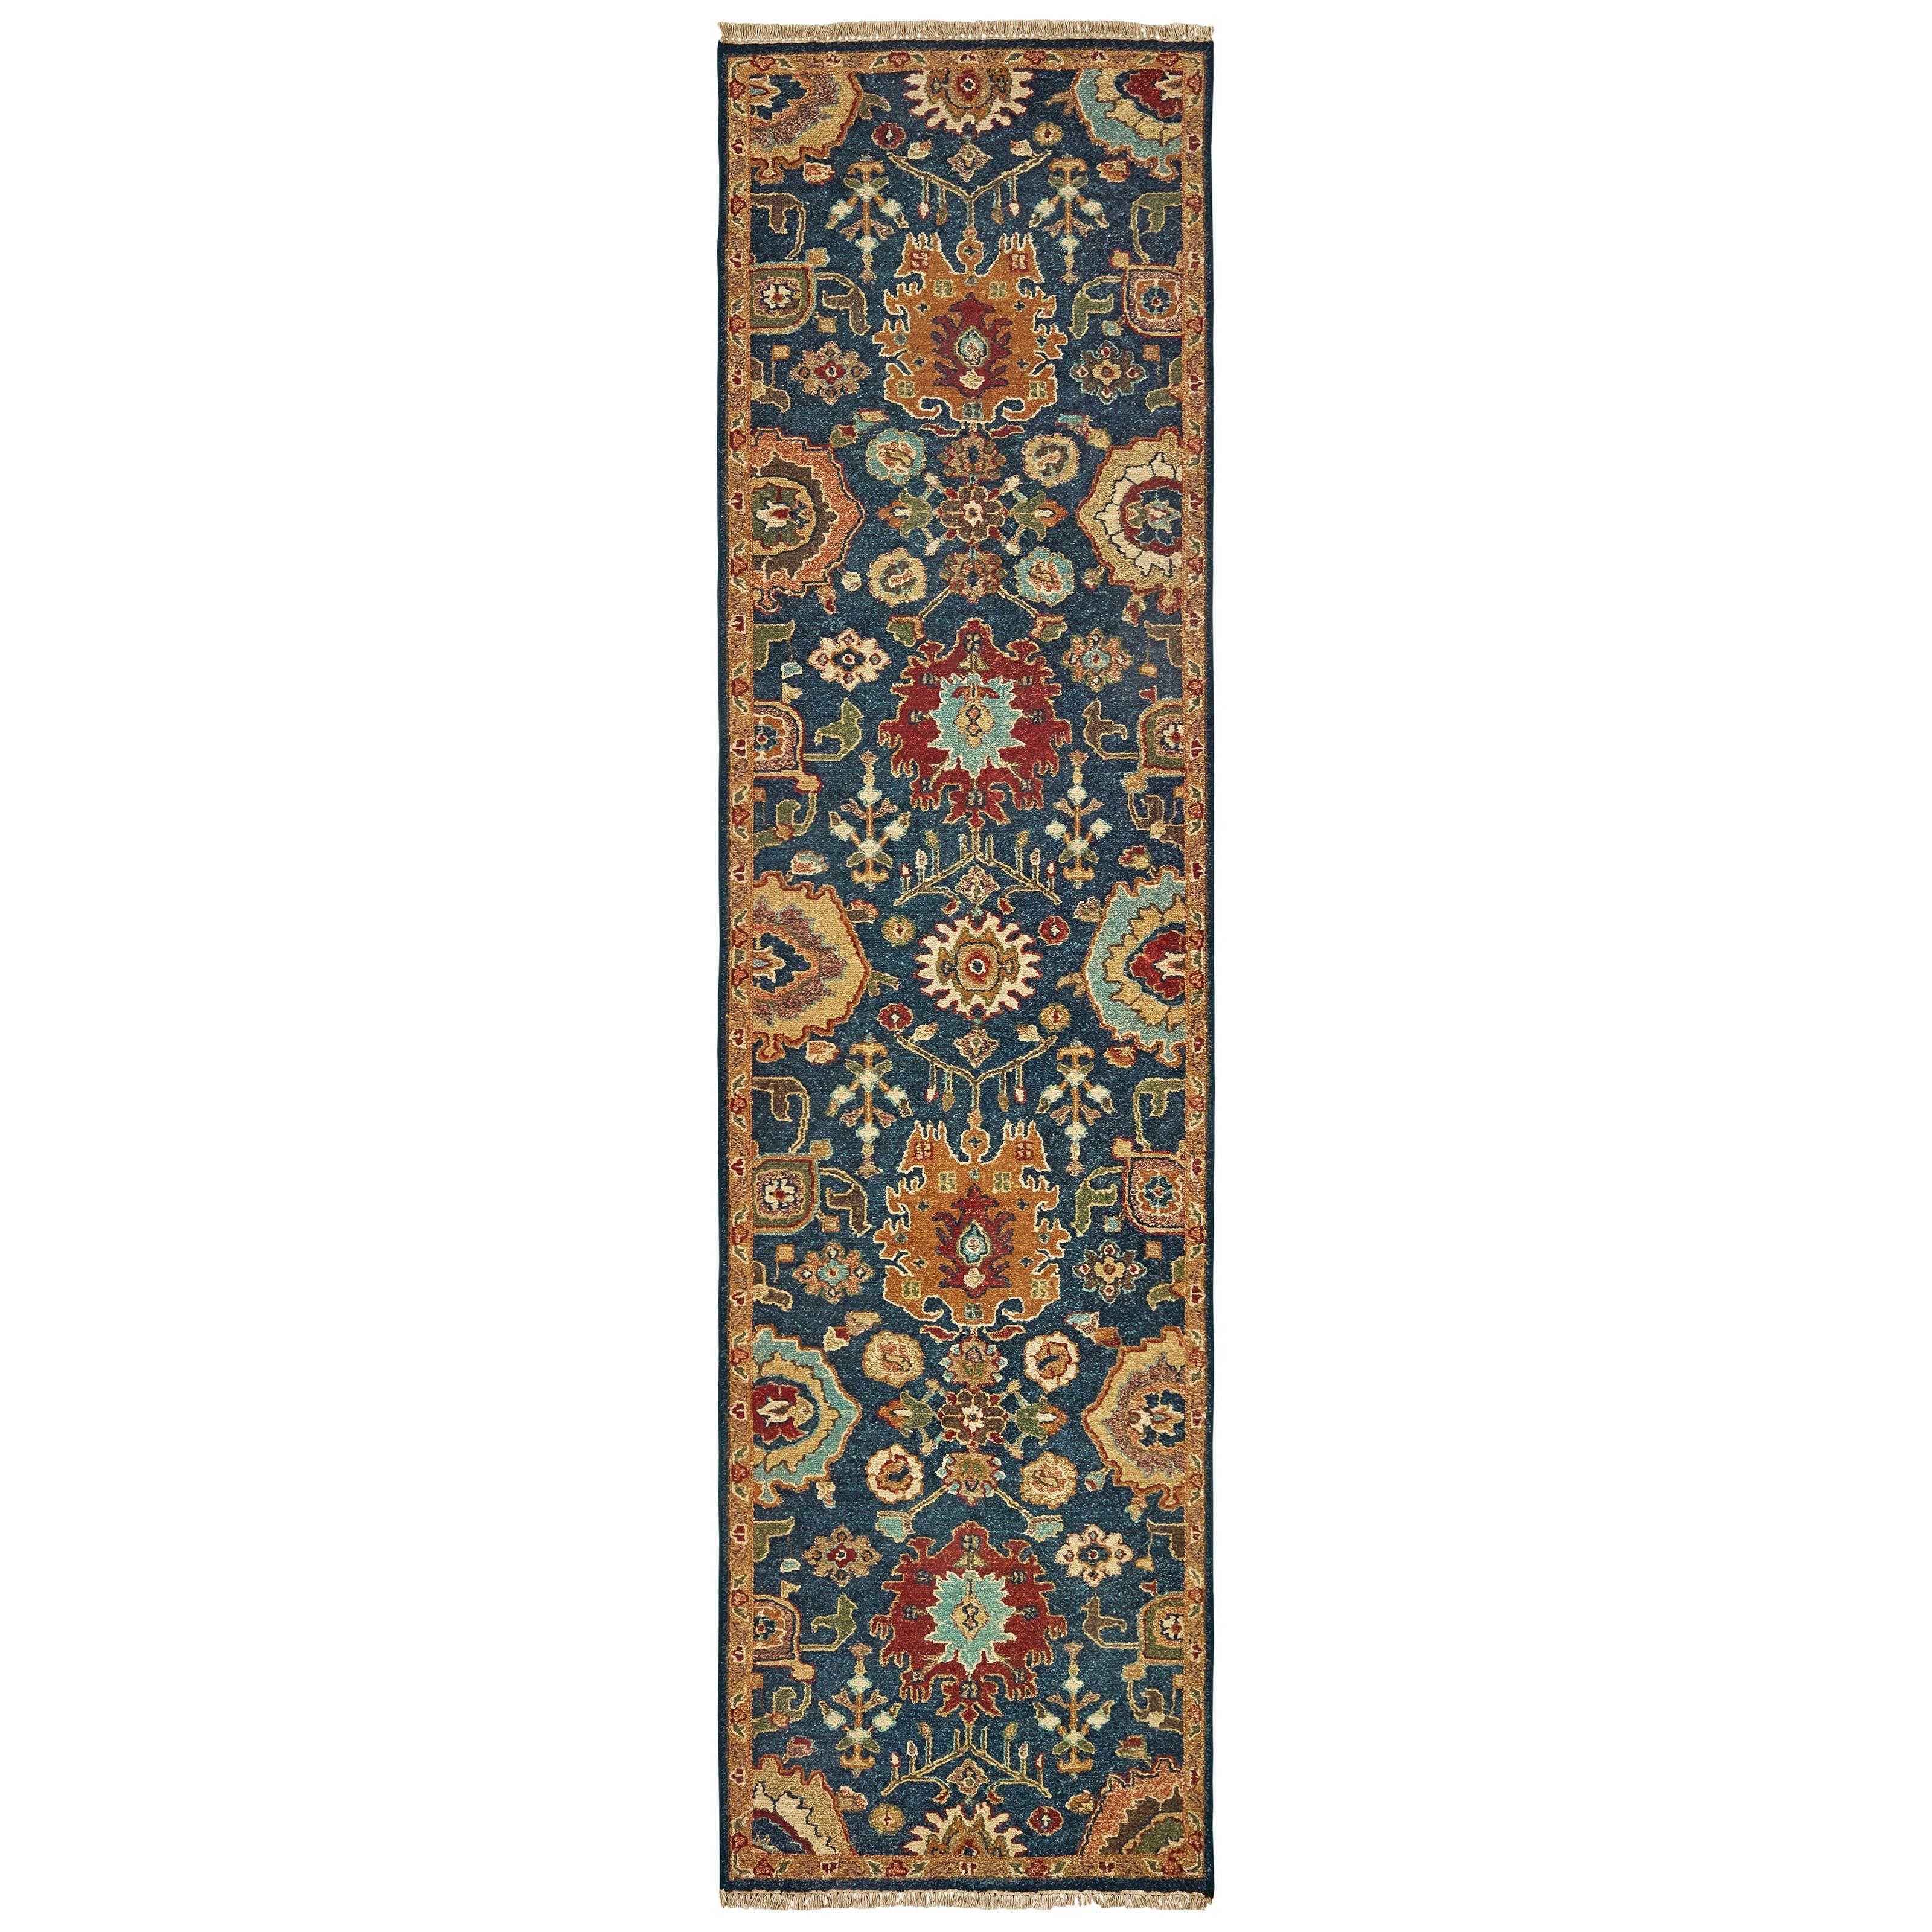 "Angora 2' 6"" X 10' Runner Rug by Oriental Weavers at Steger's Furniture"